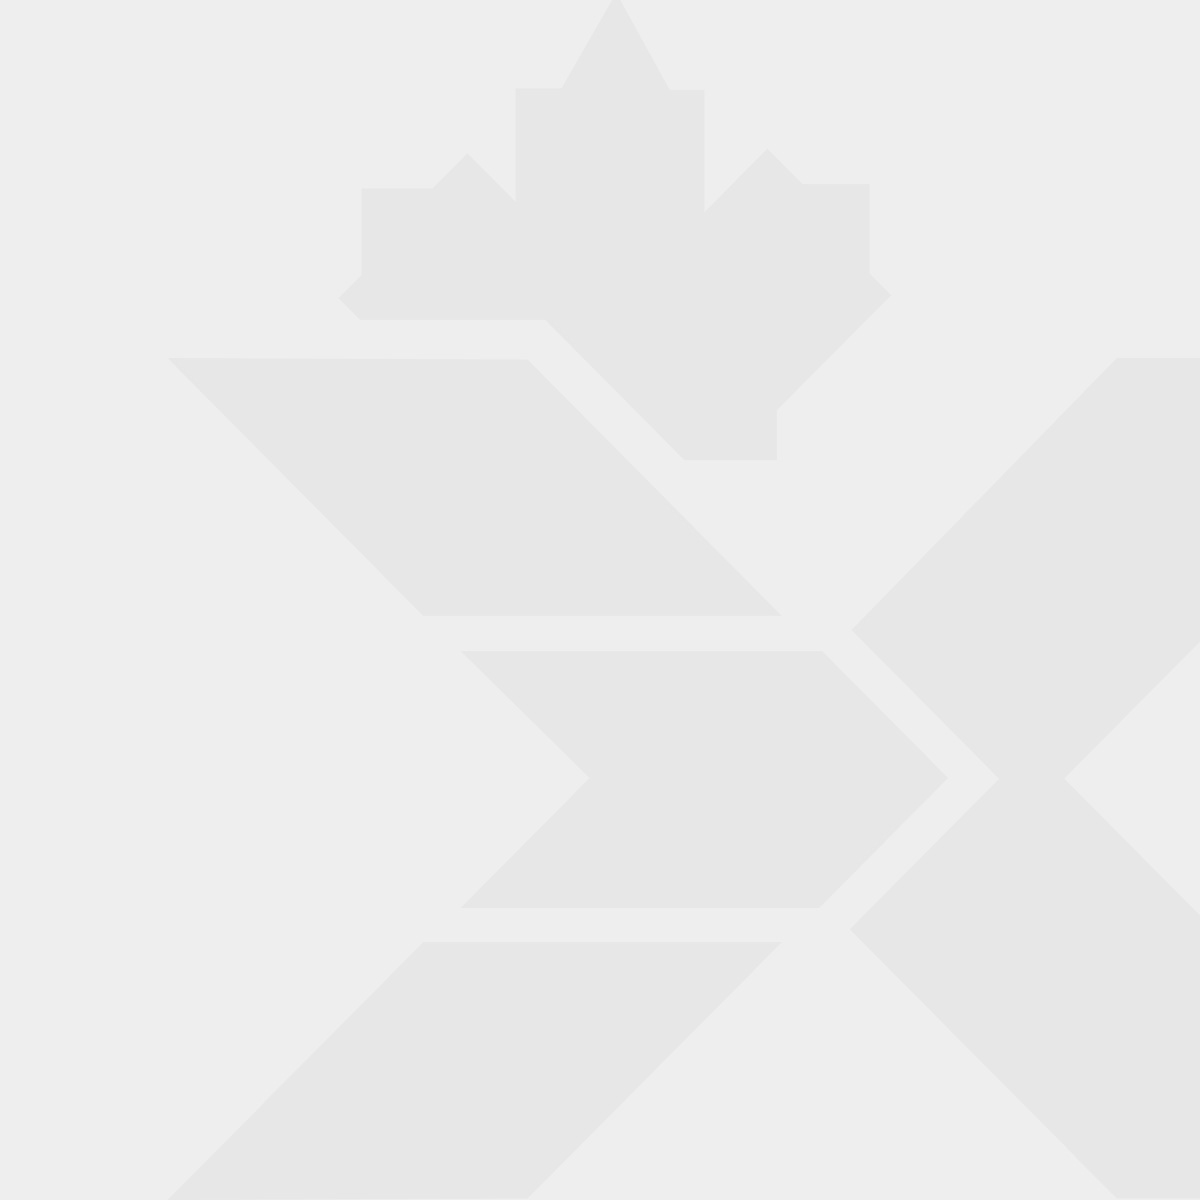 THE ROYAL CANADIAN LEGION - VIMY 1917 - Naissance d'une Nation